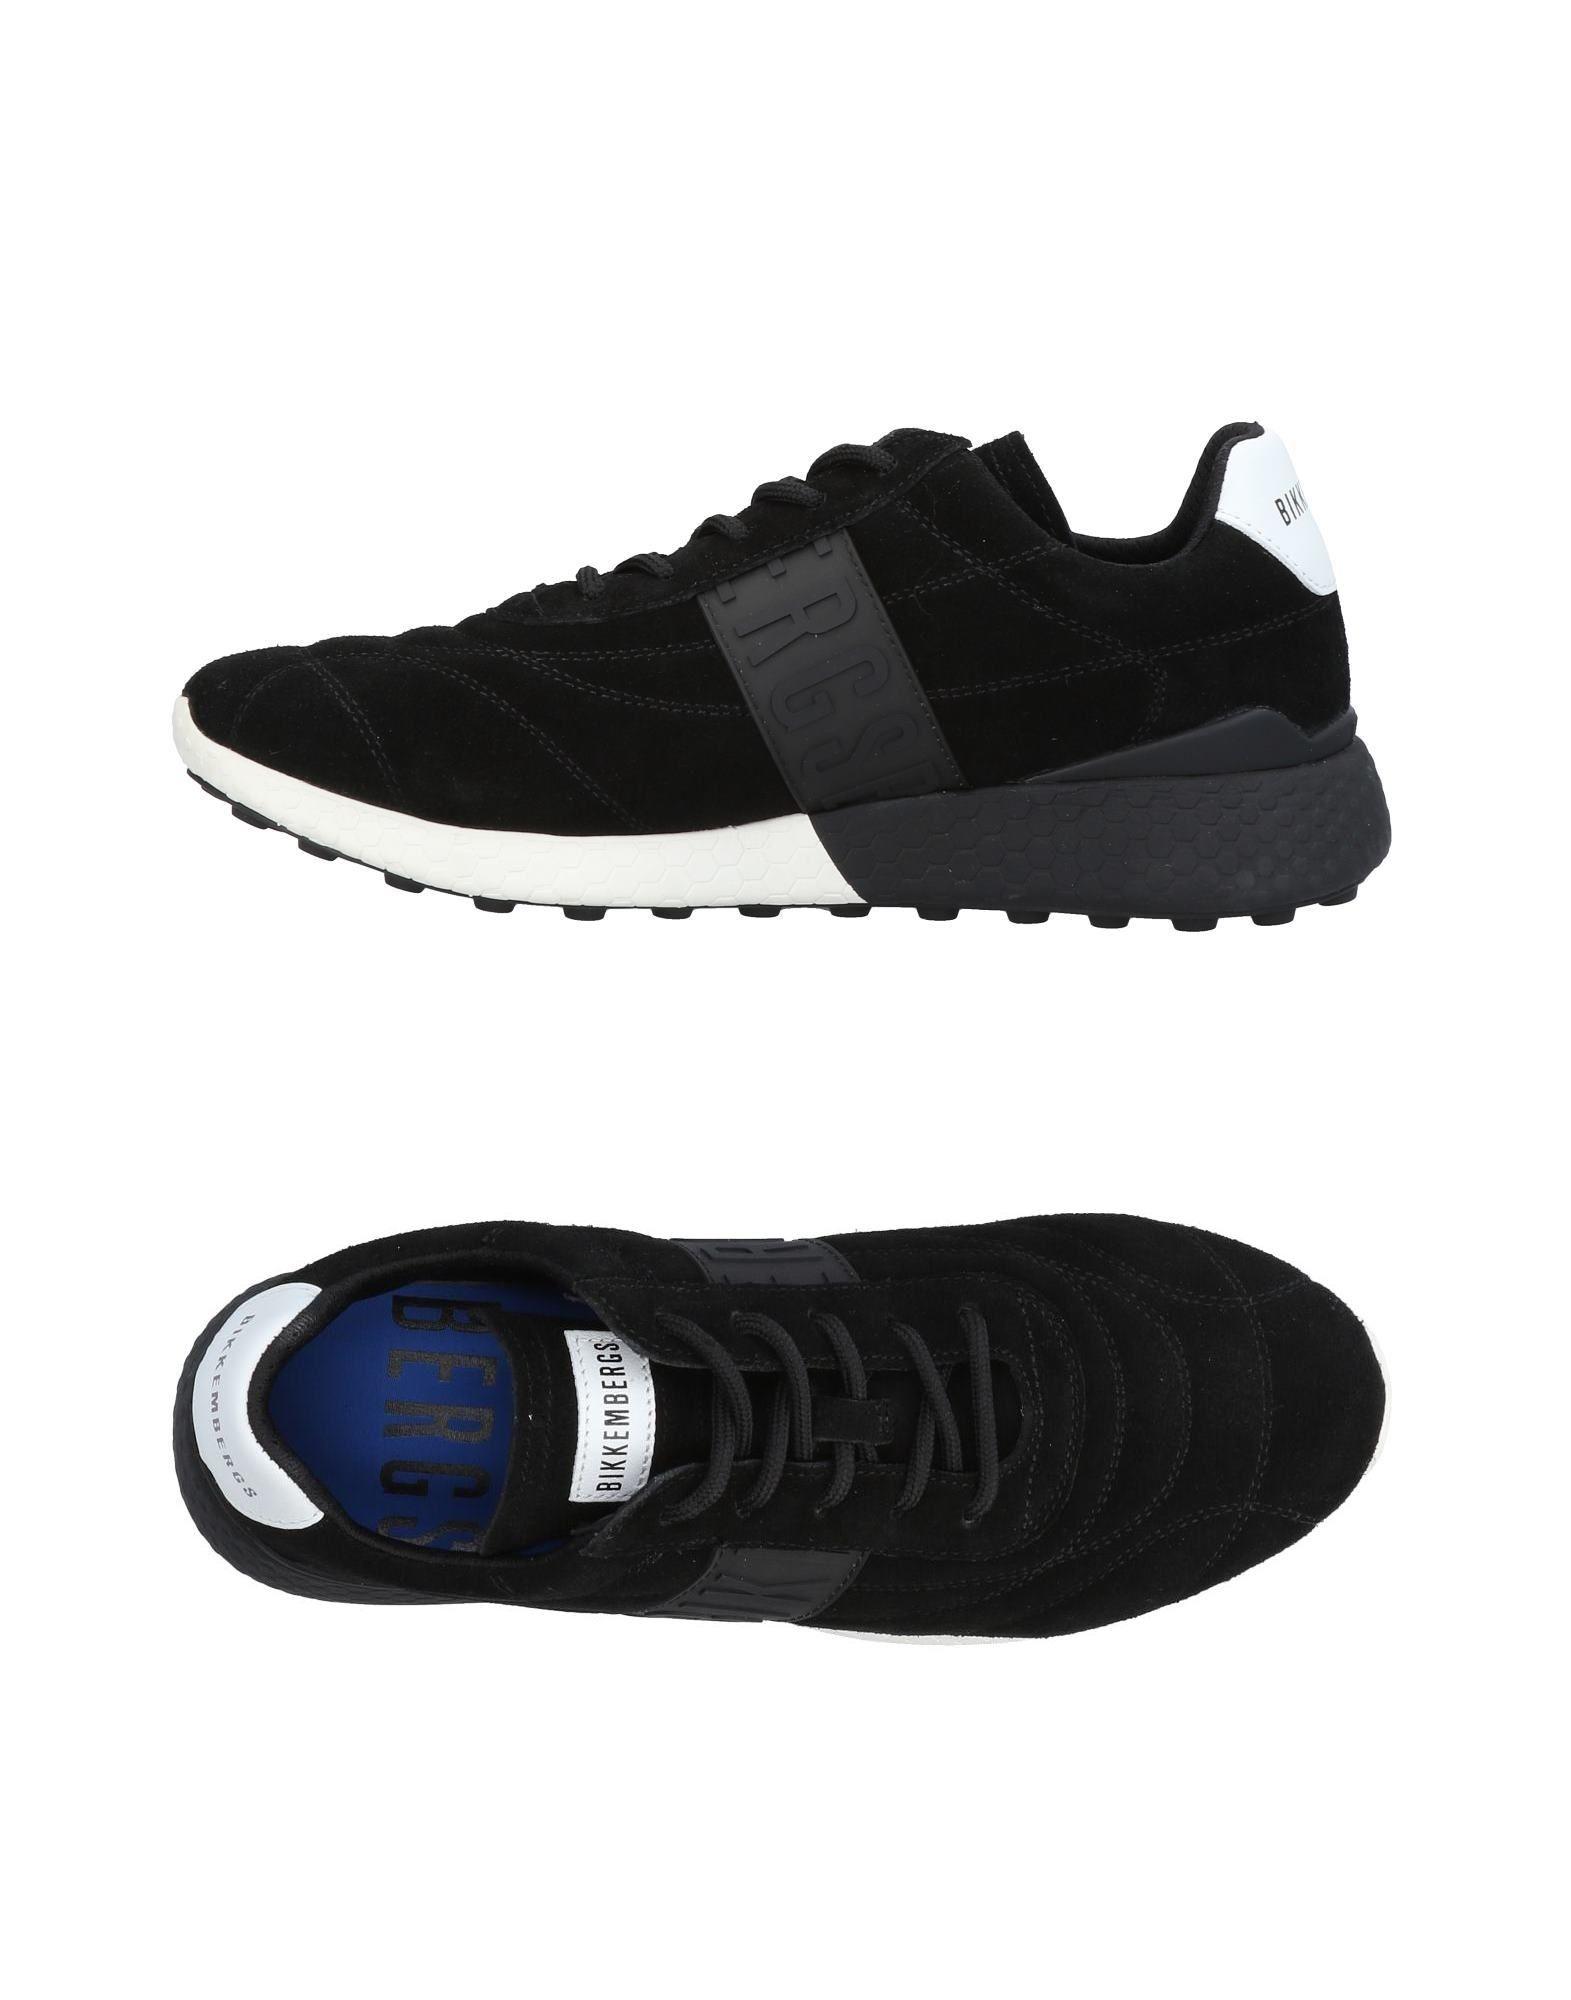 Moda Sneakers Bikkembergs Uomo - 11450984NC 11450984NC - 9761cc